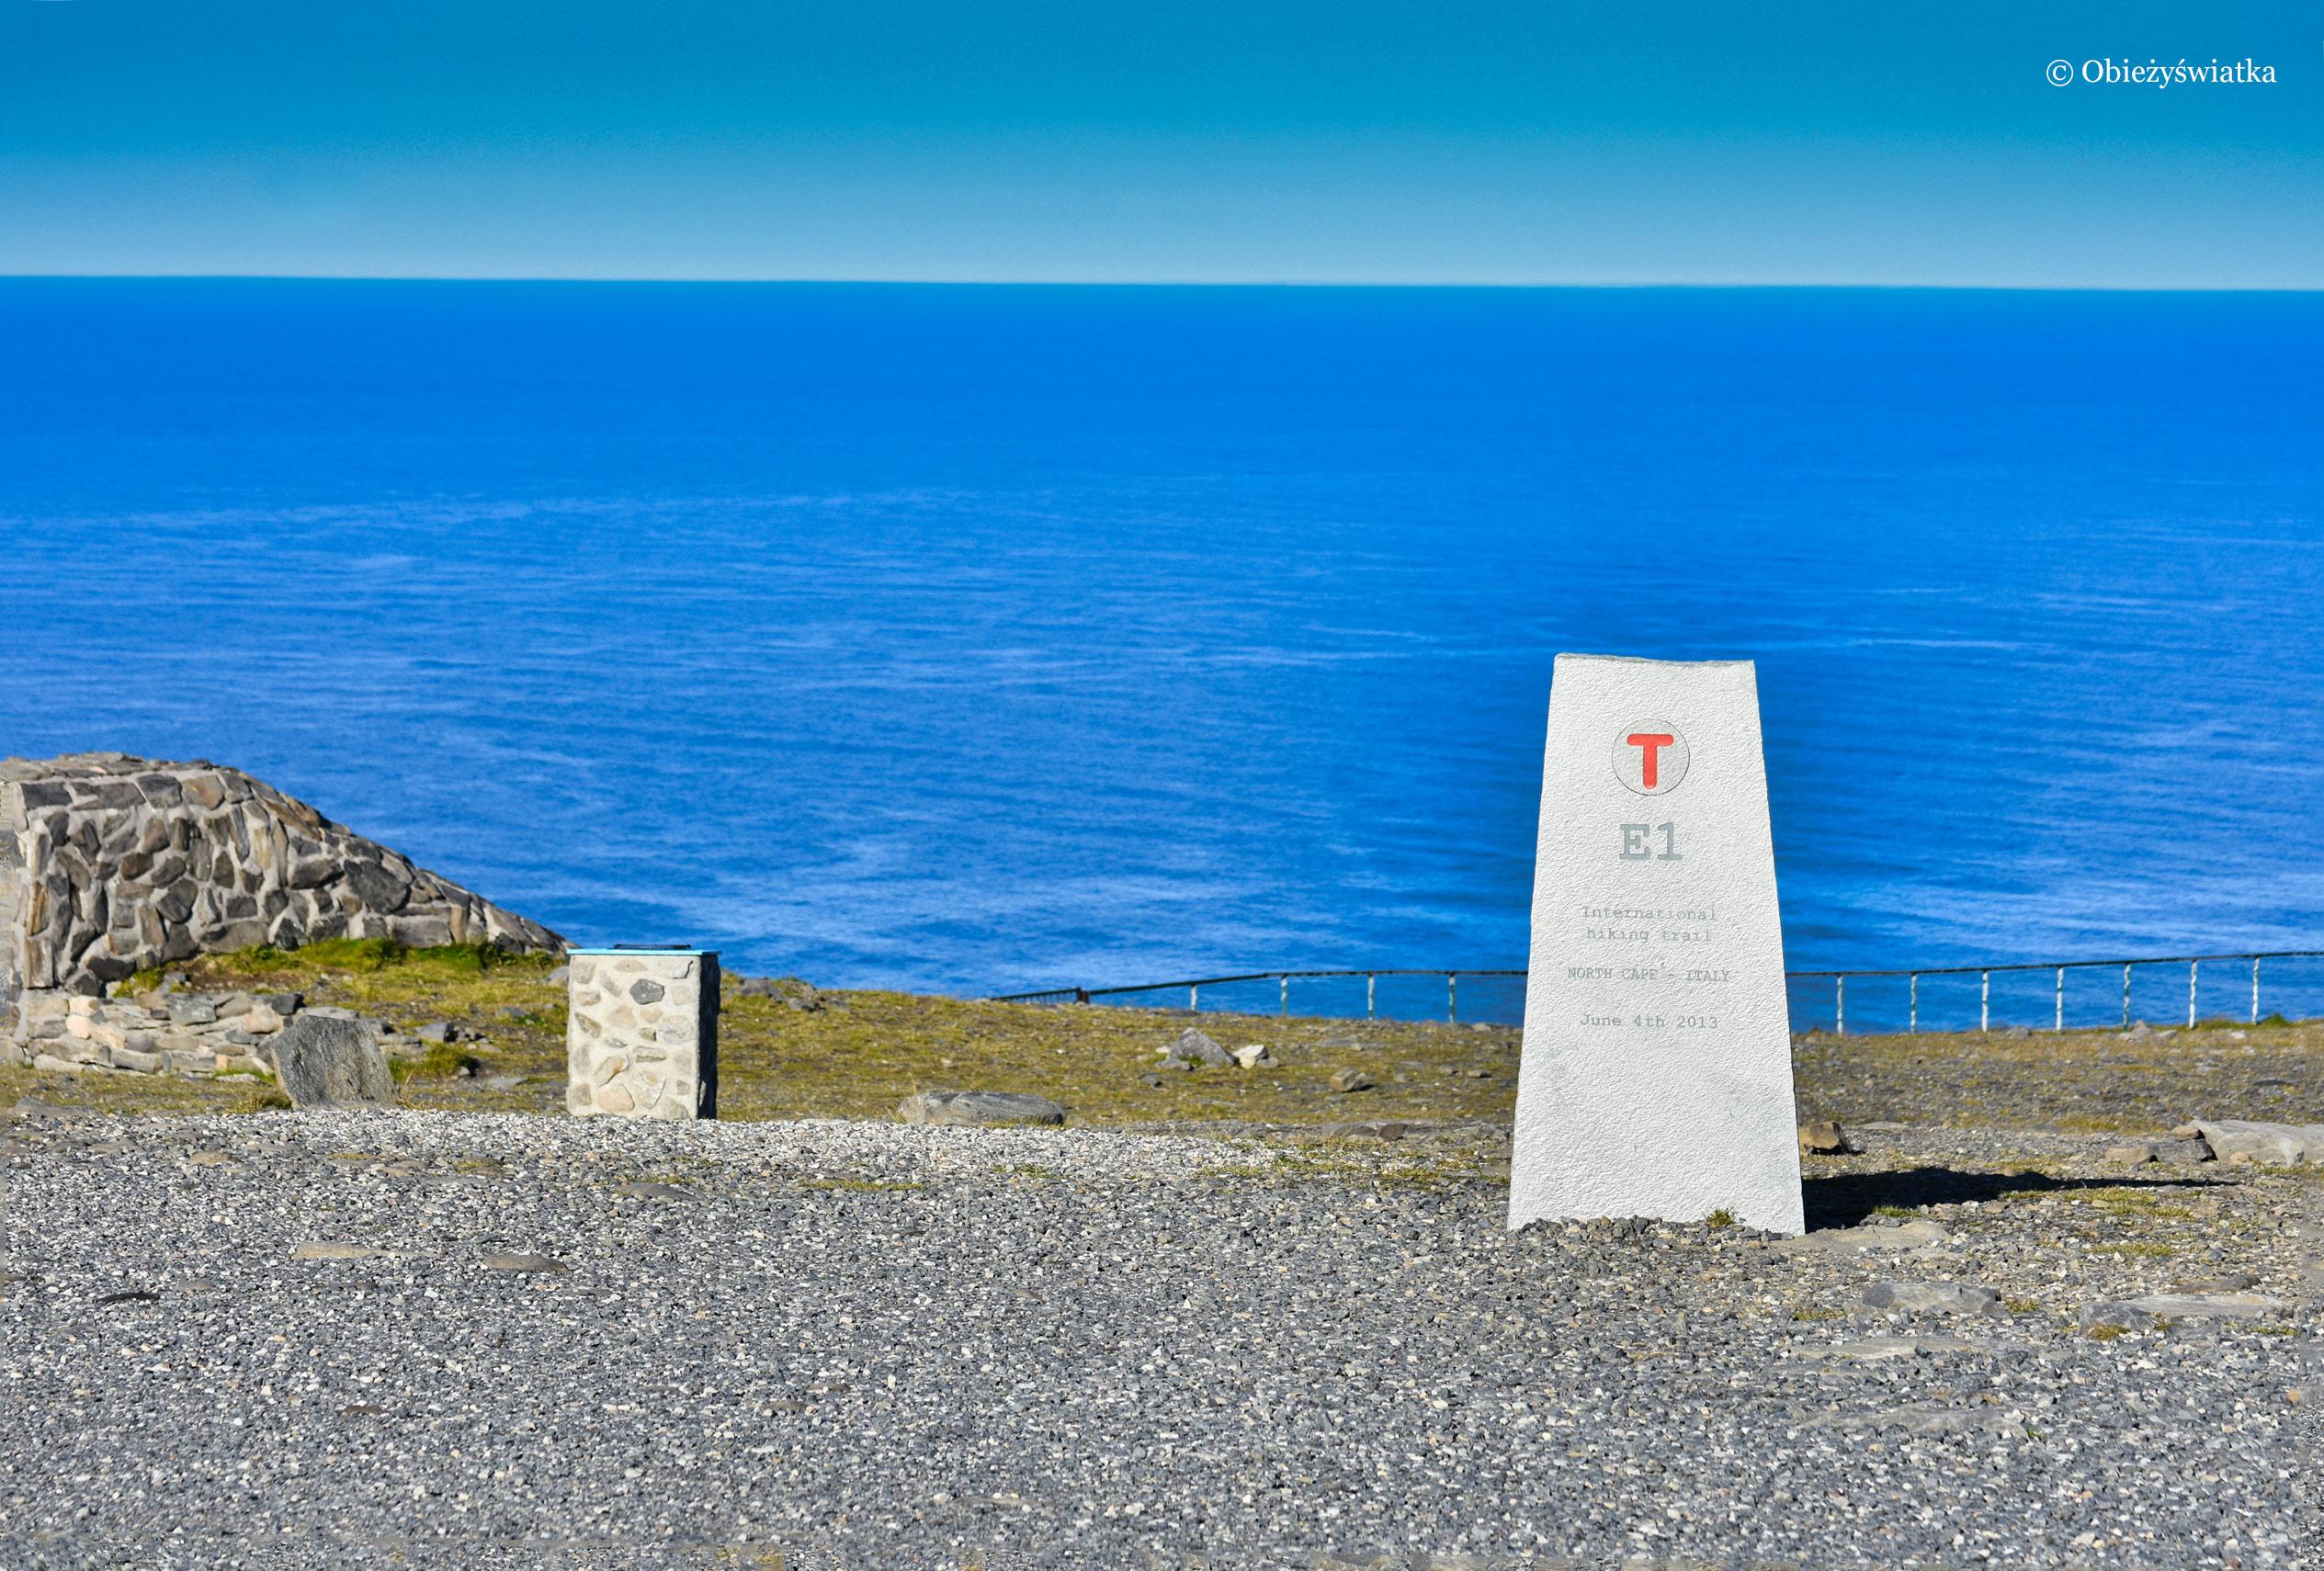 Teren Przylądka Północnego, Nordkapp, Norwegia